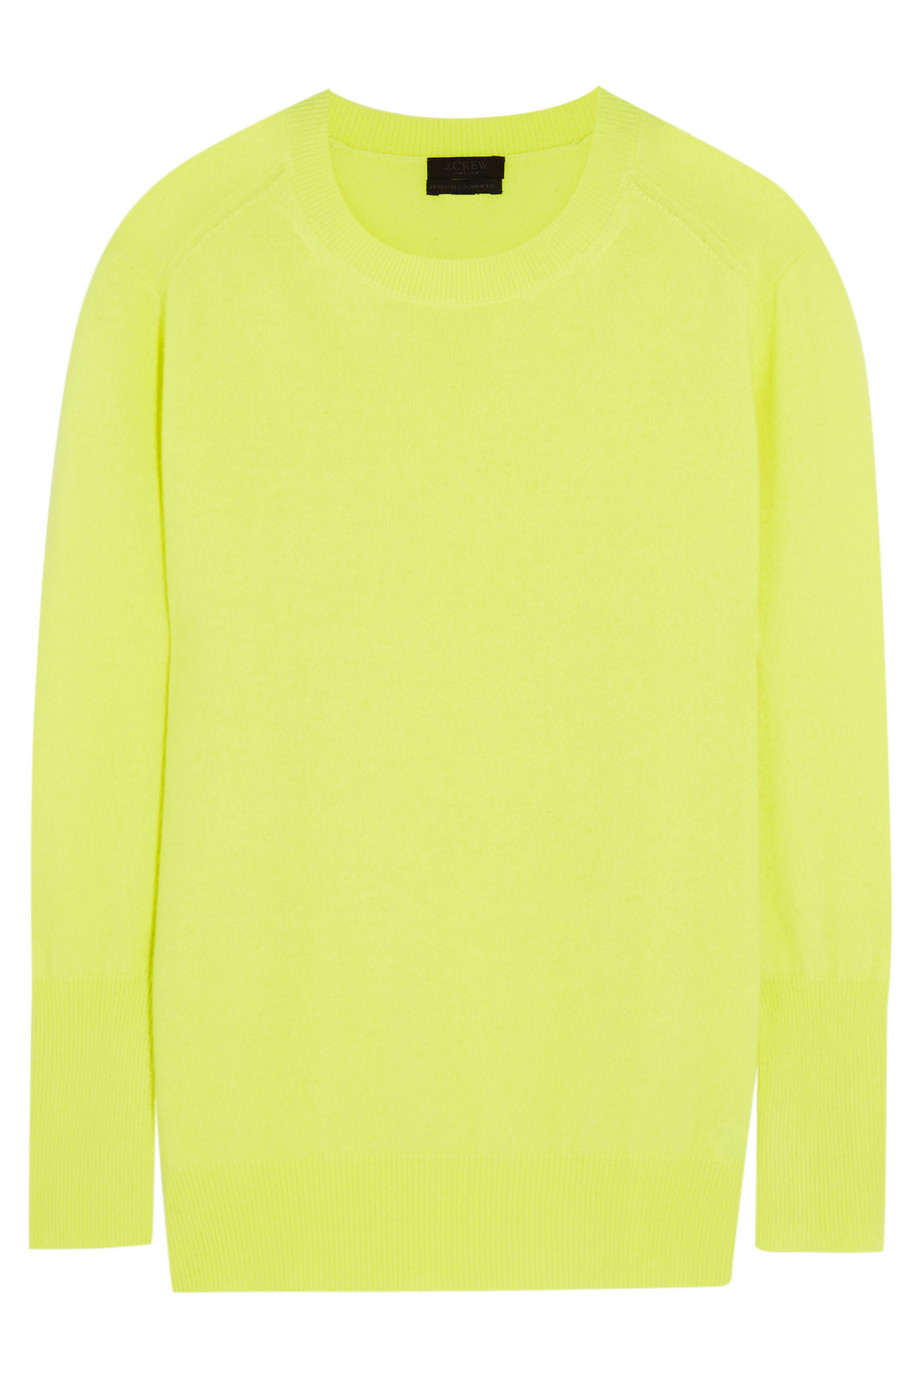 J.Crew Cashmere Sweater, Size: XS